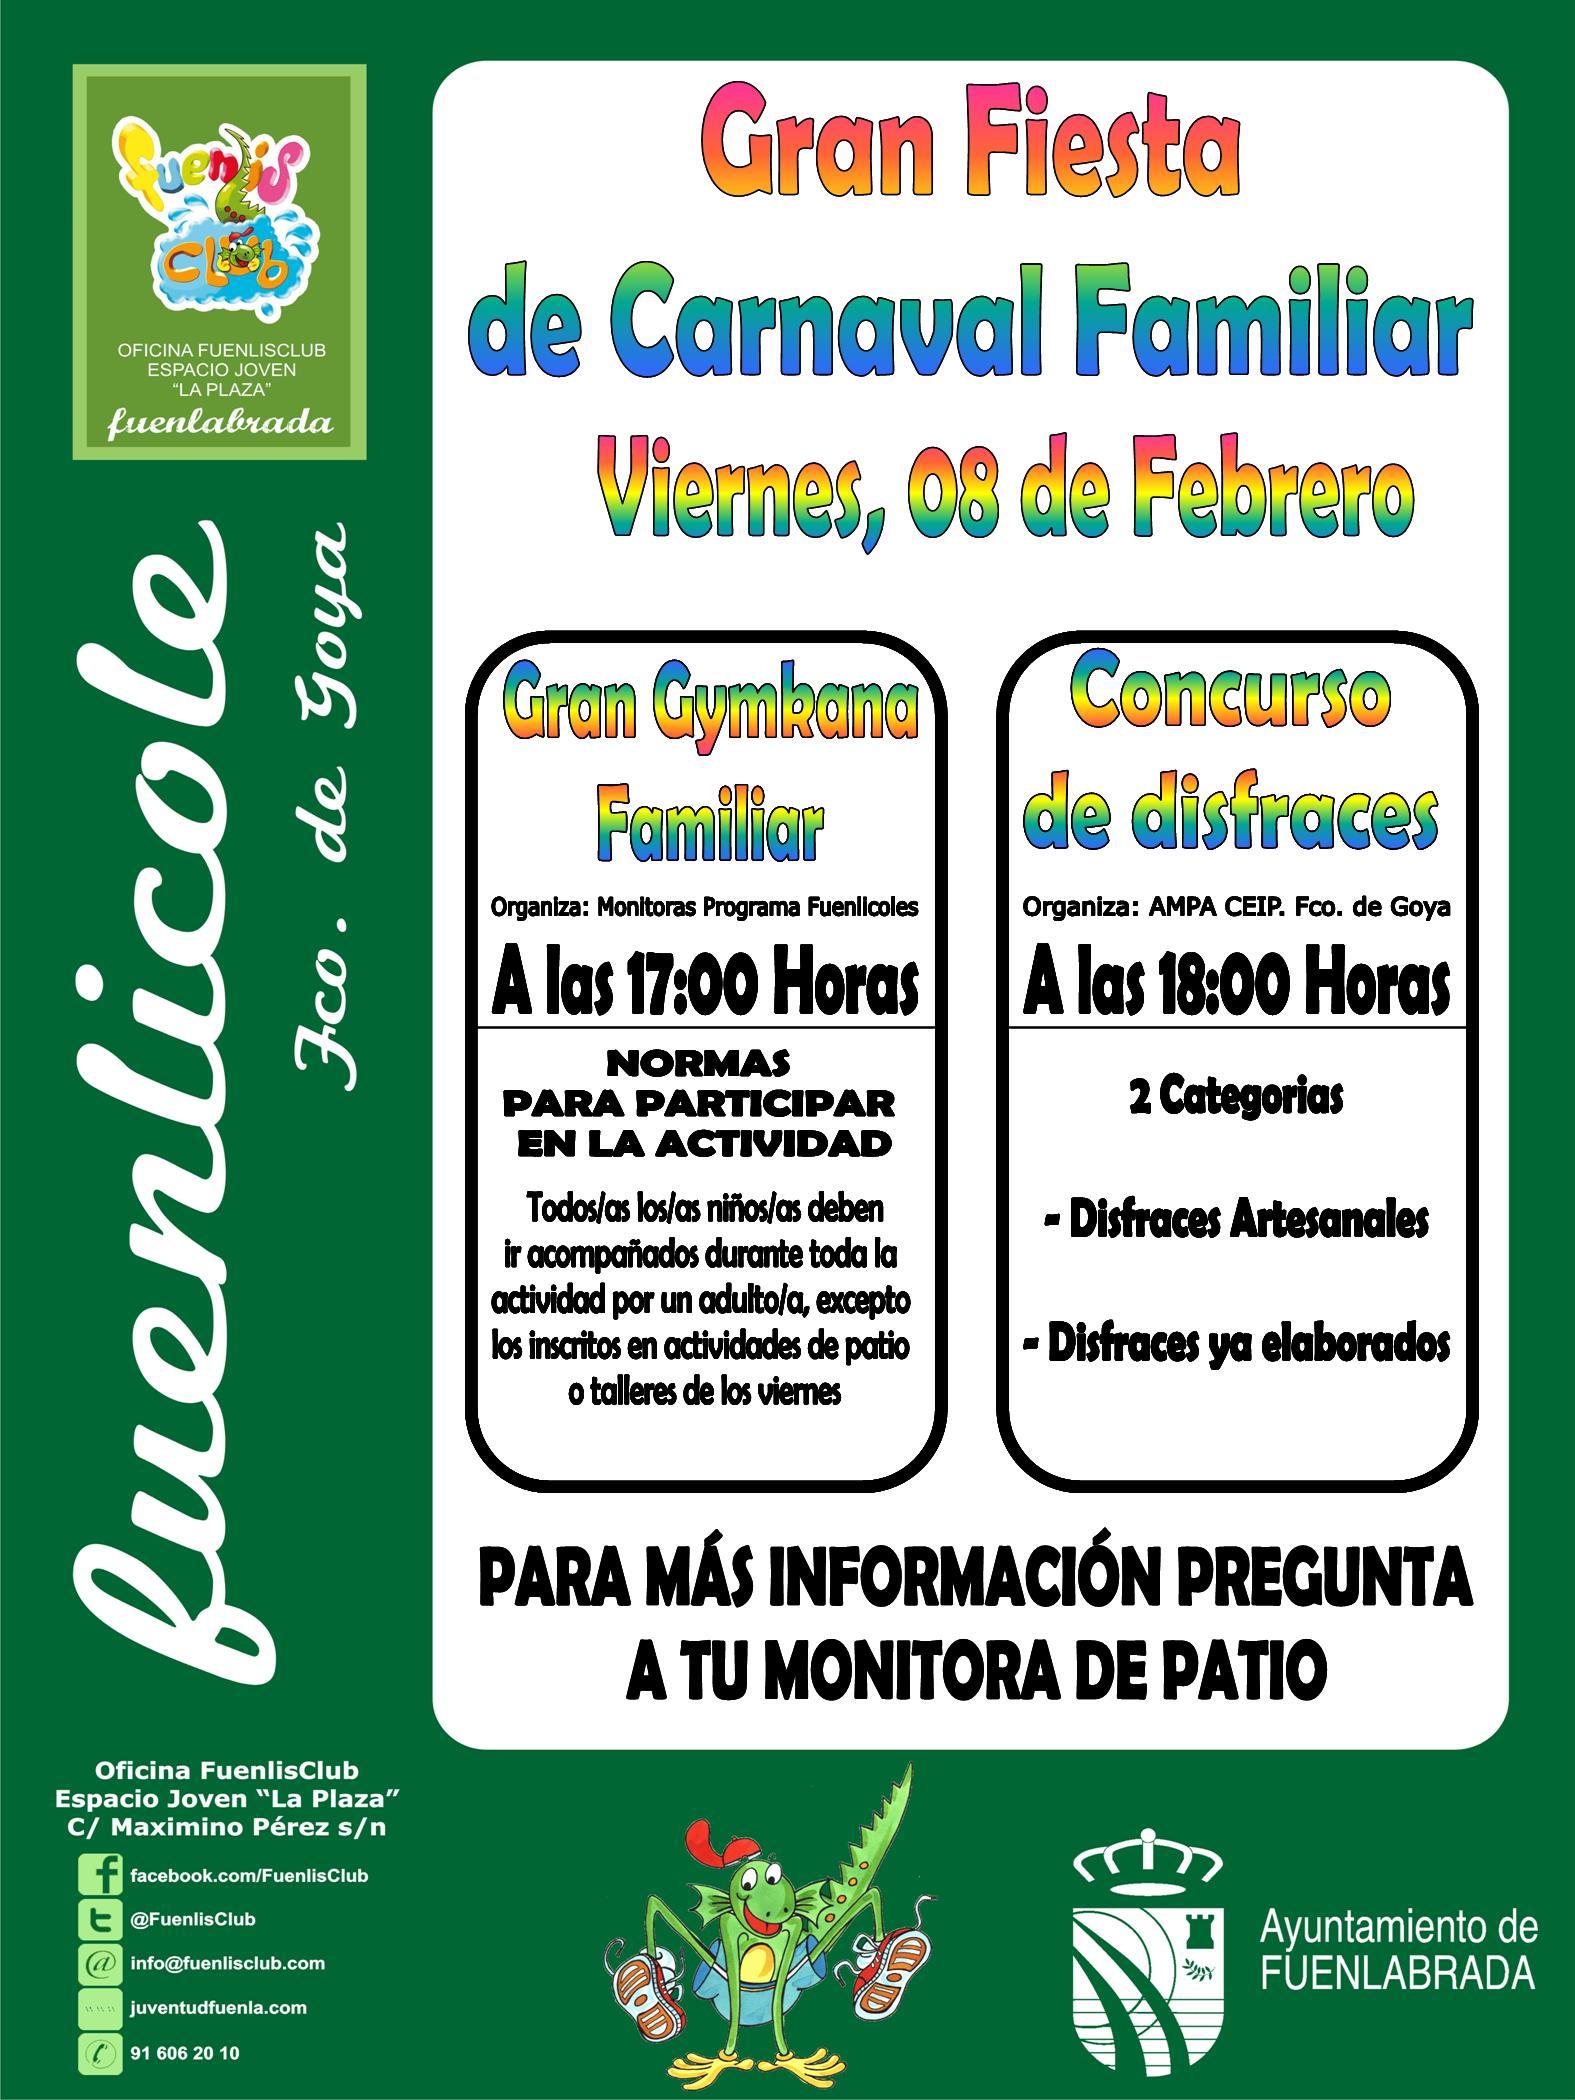 Carnaval Fco. de Goya